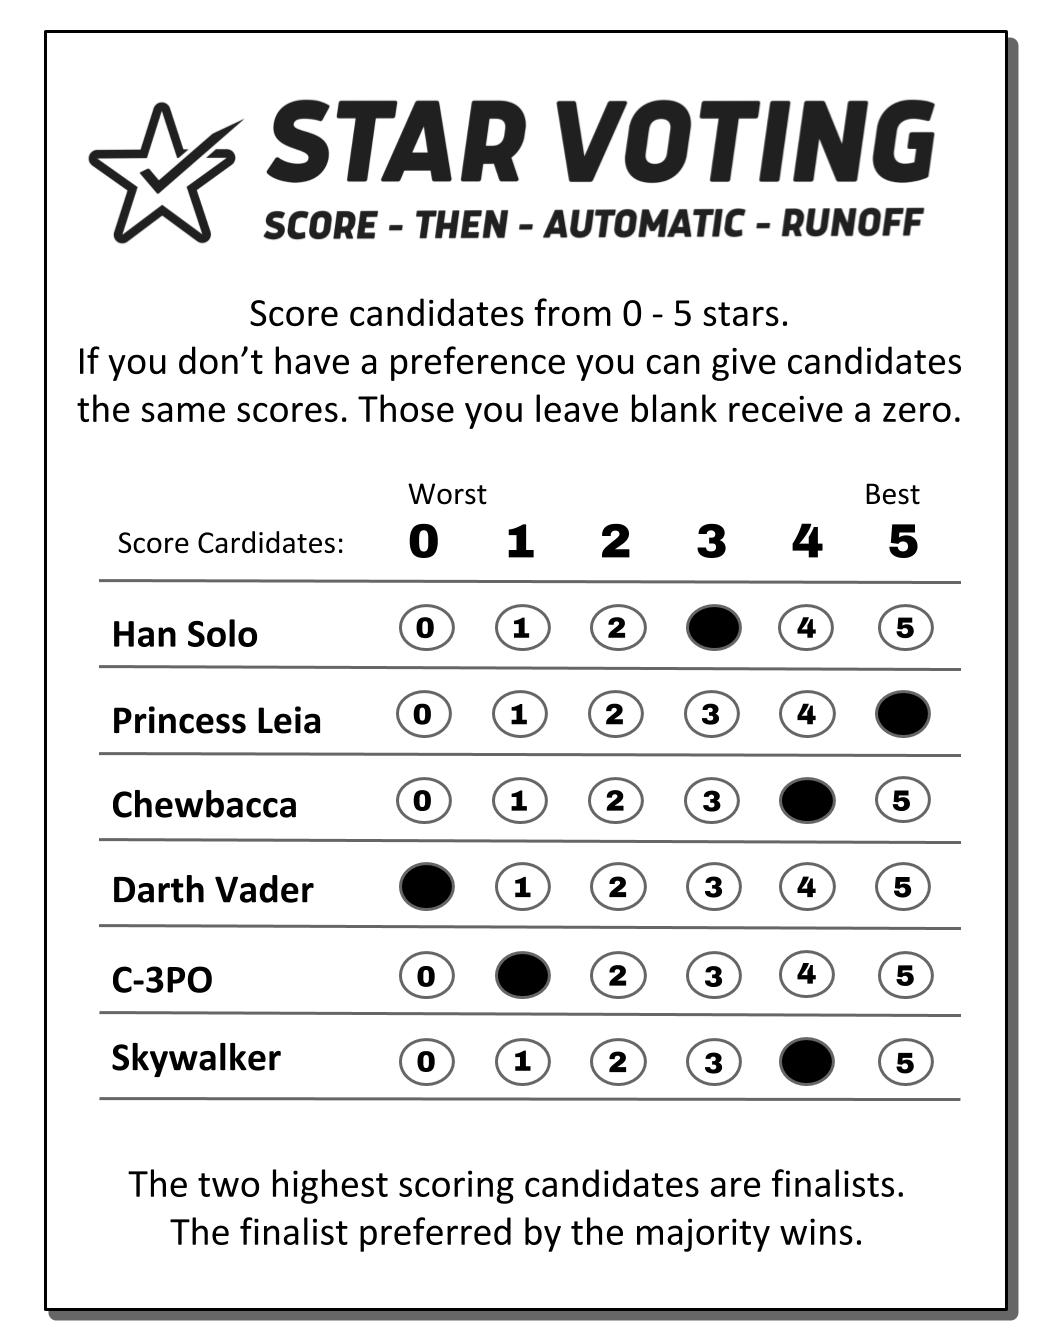 STAR Voting Ballot